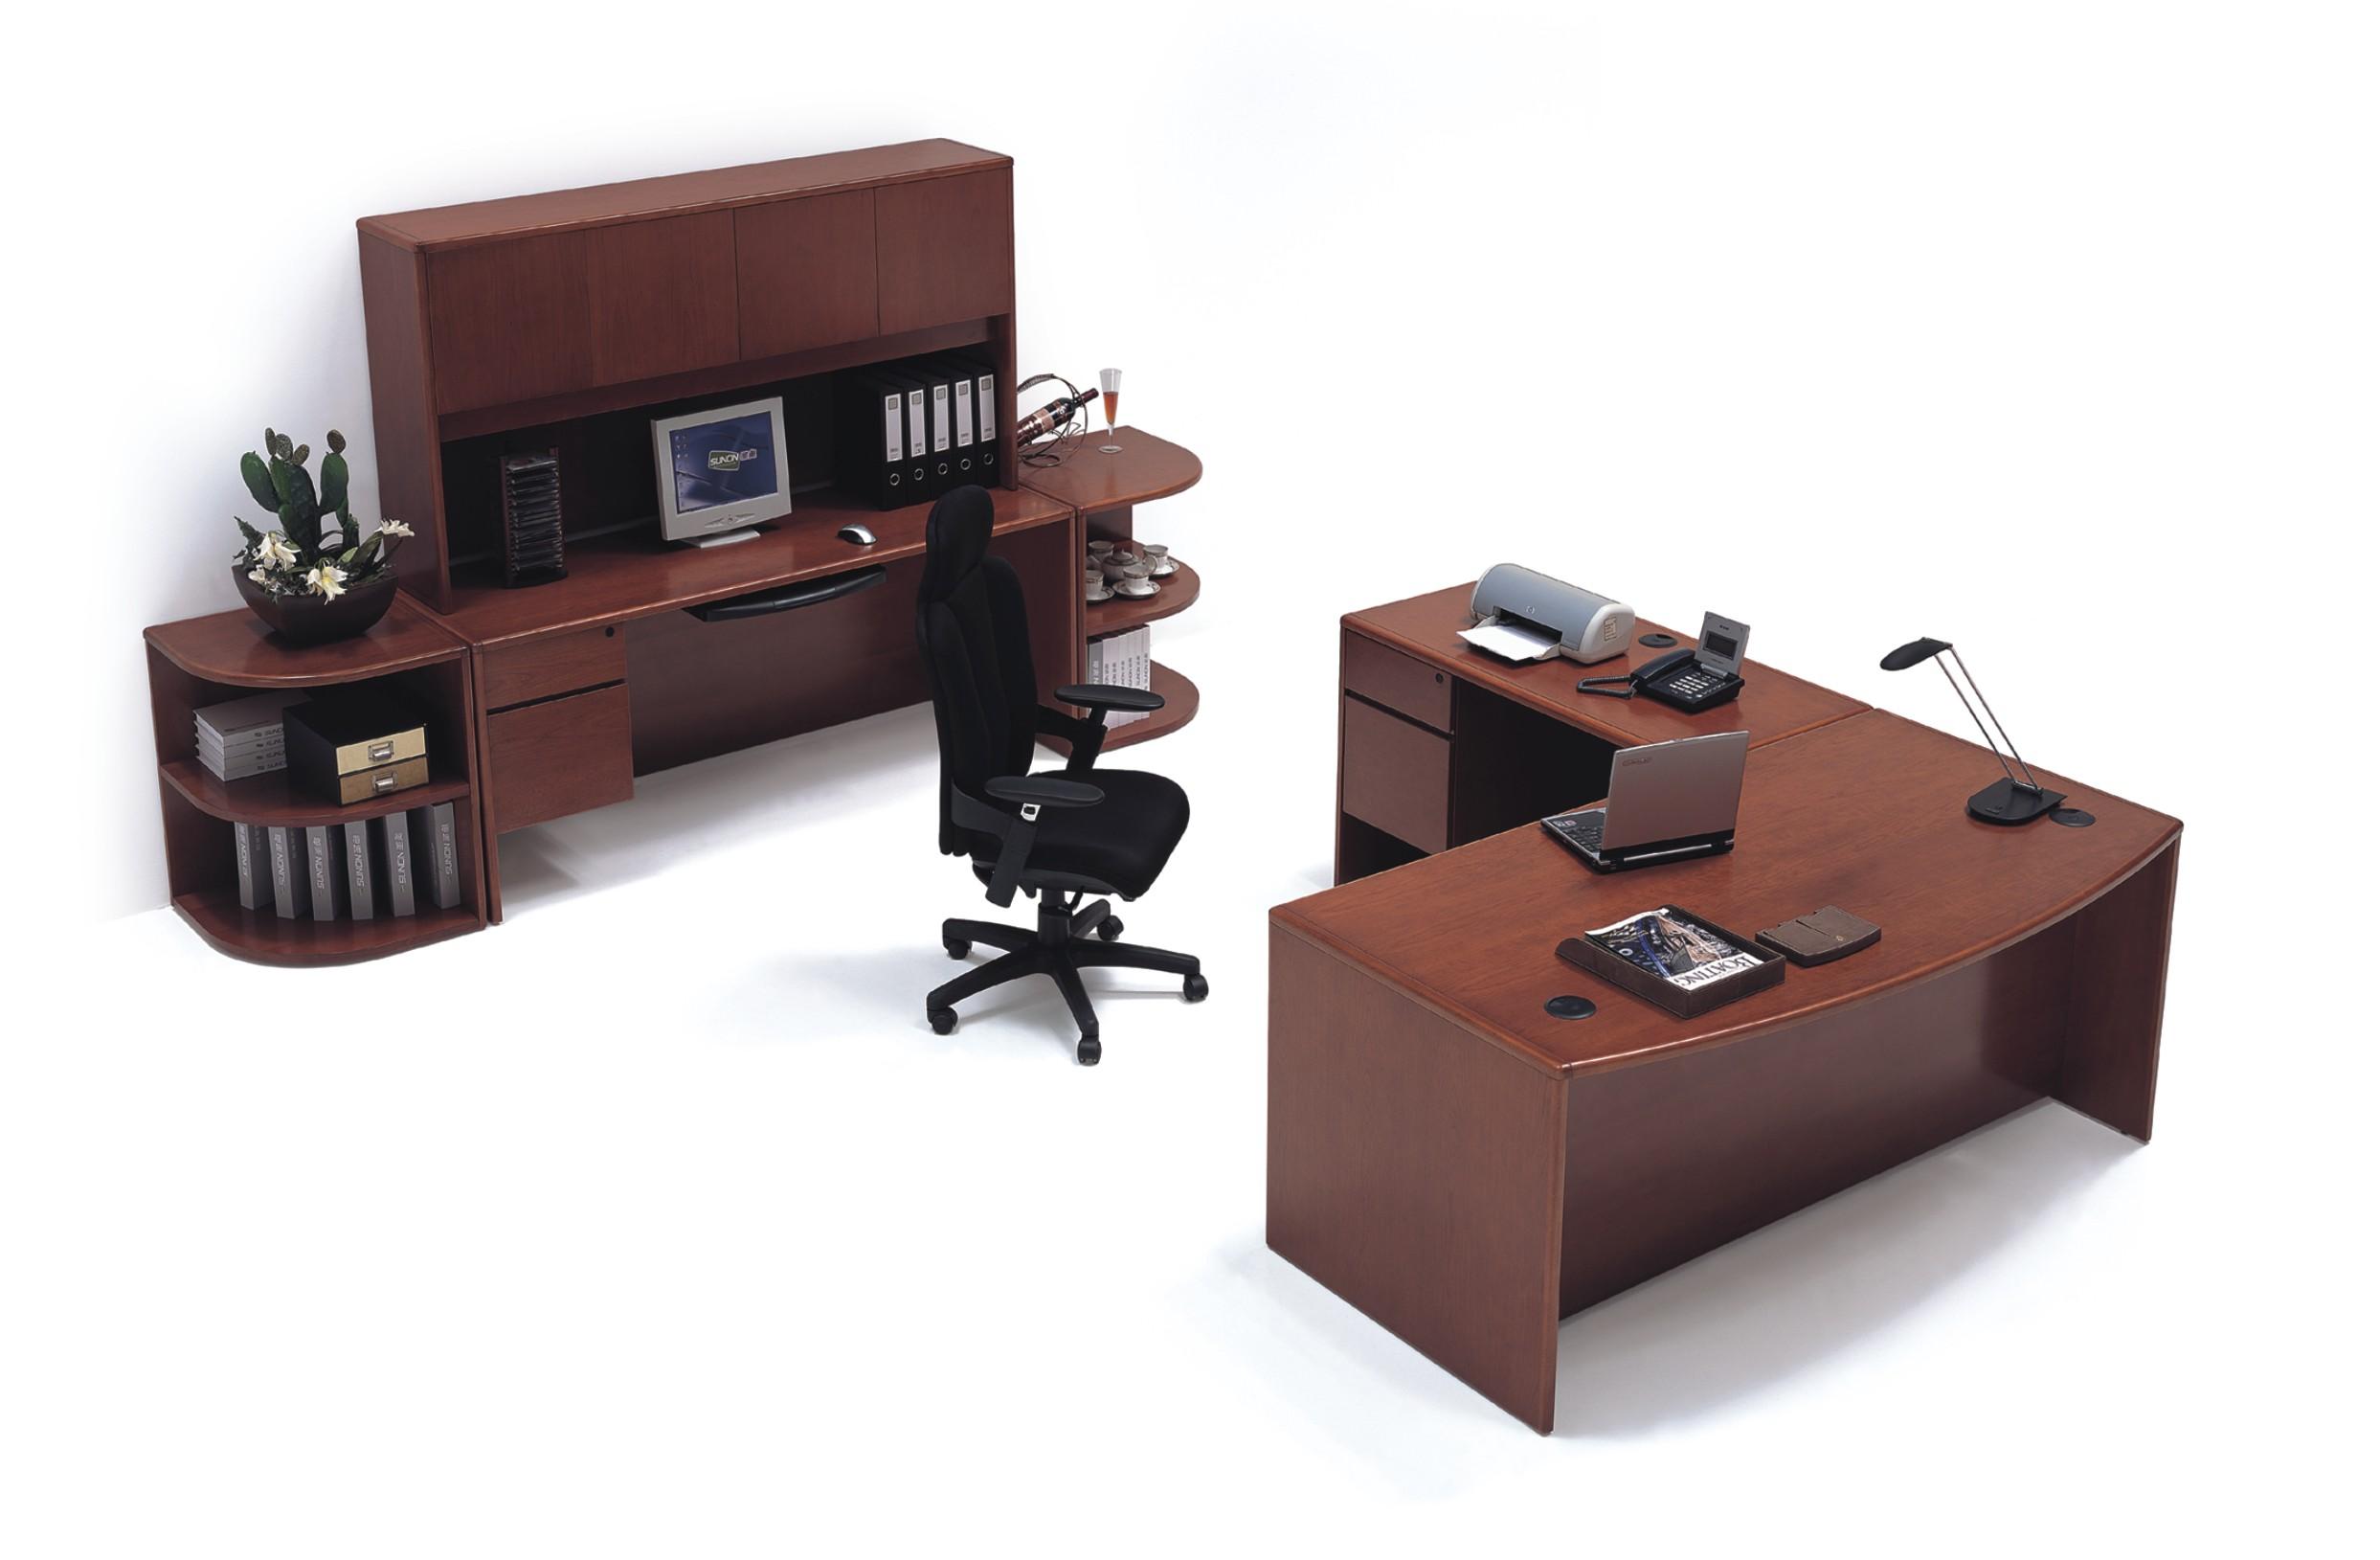 Steelcraft Radius Edge Office Desk